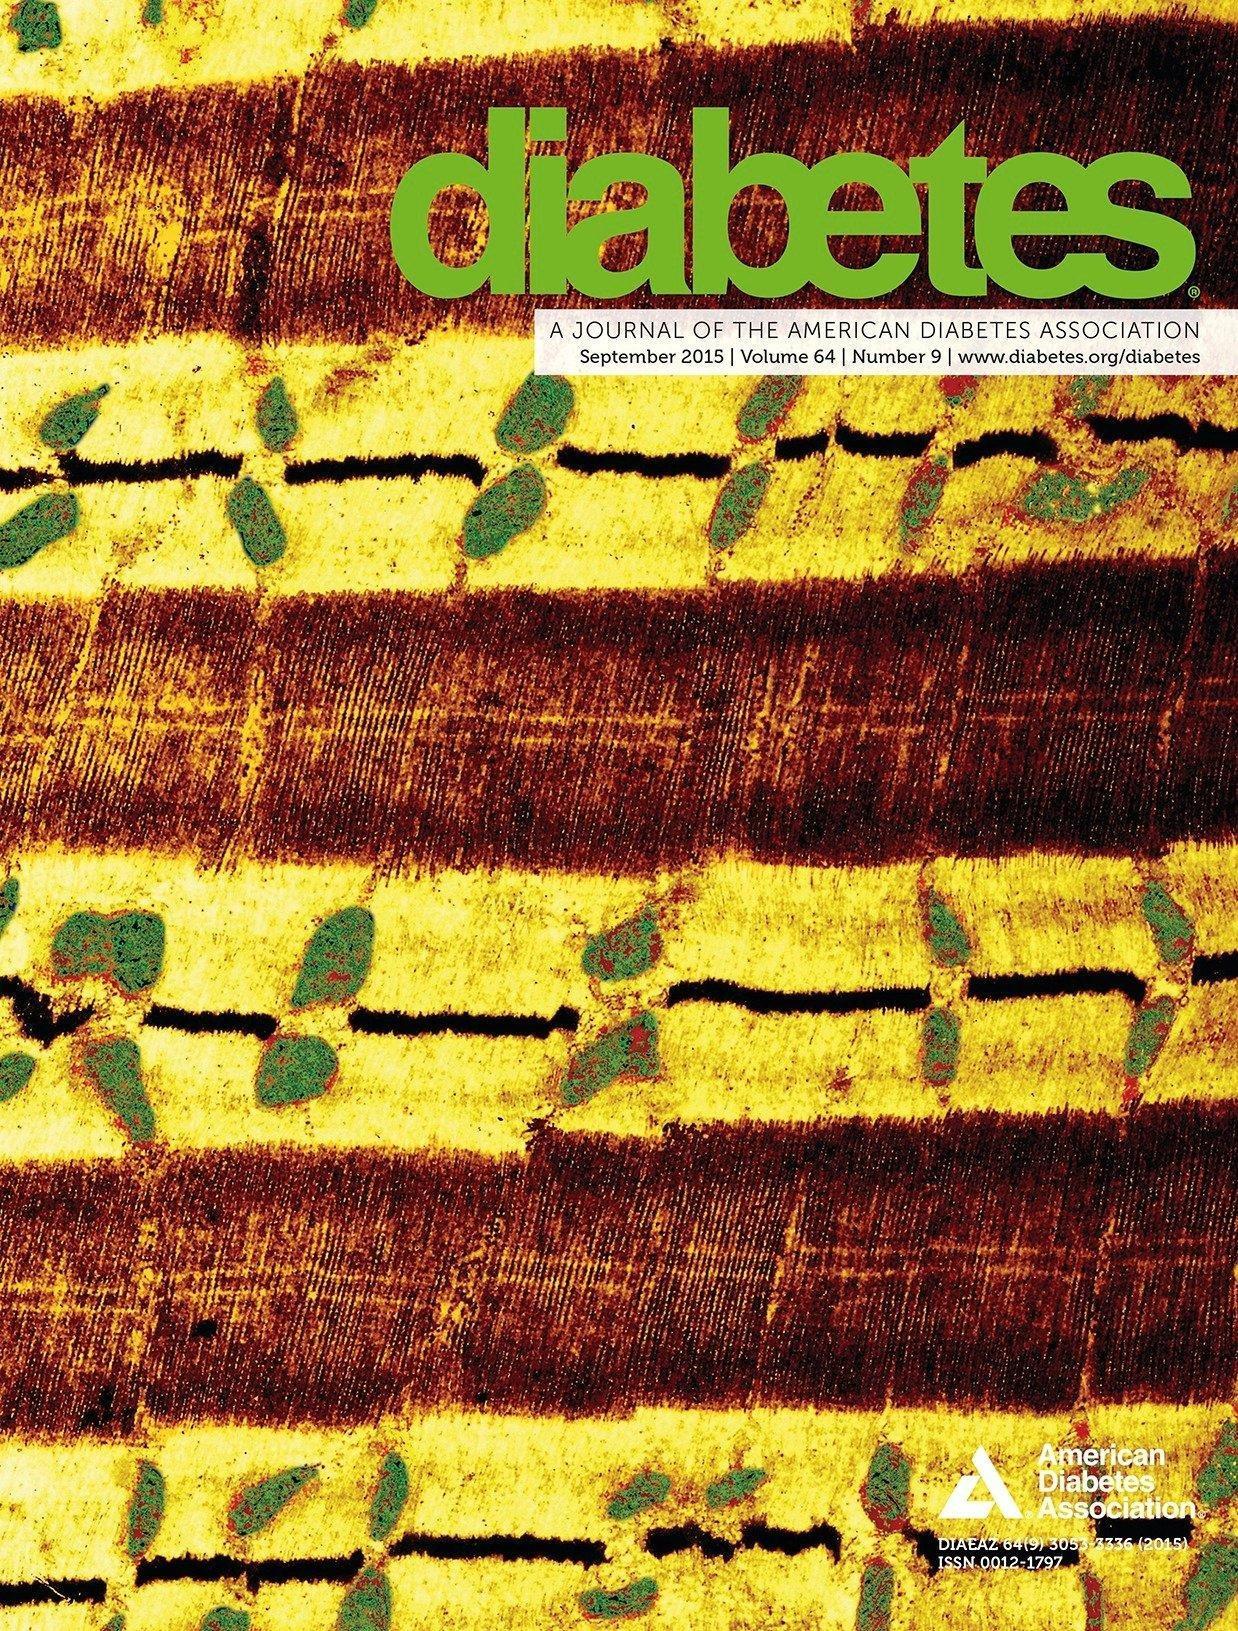 Hdl Cholesterol And Risk Of Type 2 Diabetes: A Mendelian Randomization Study